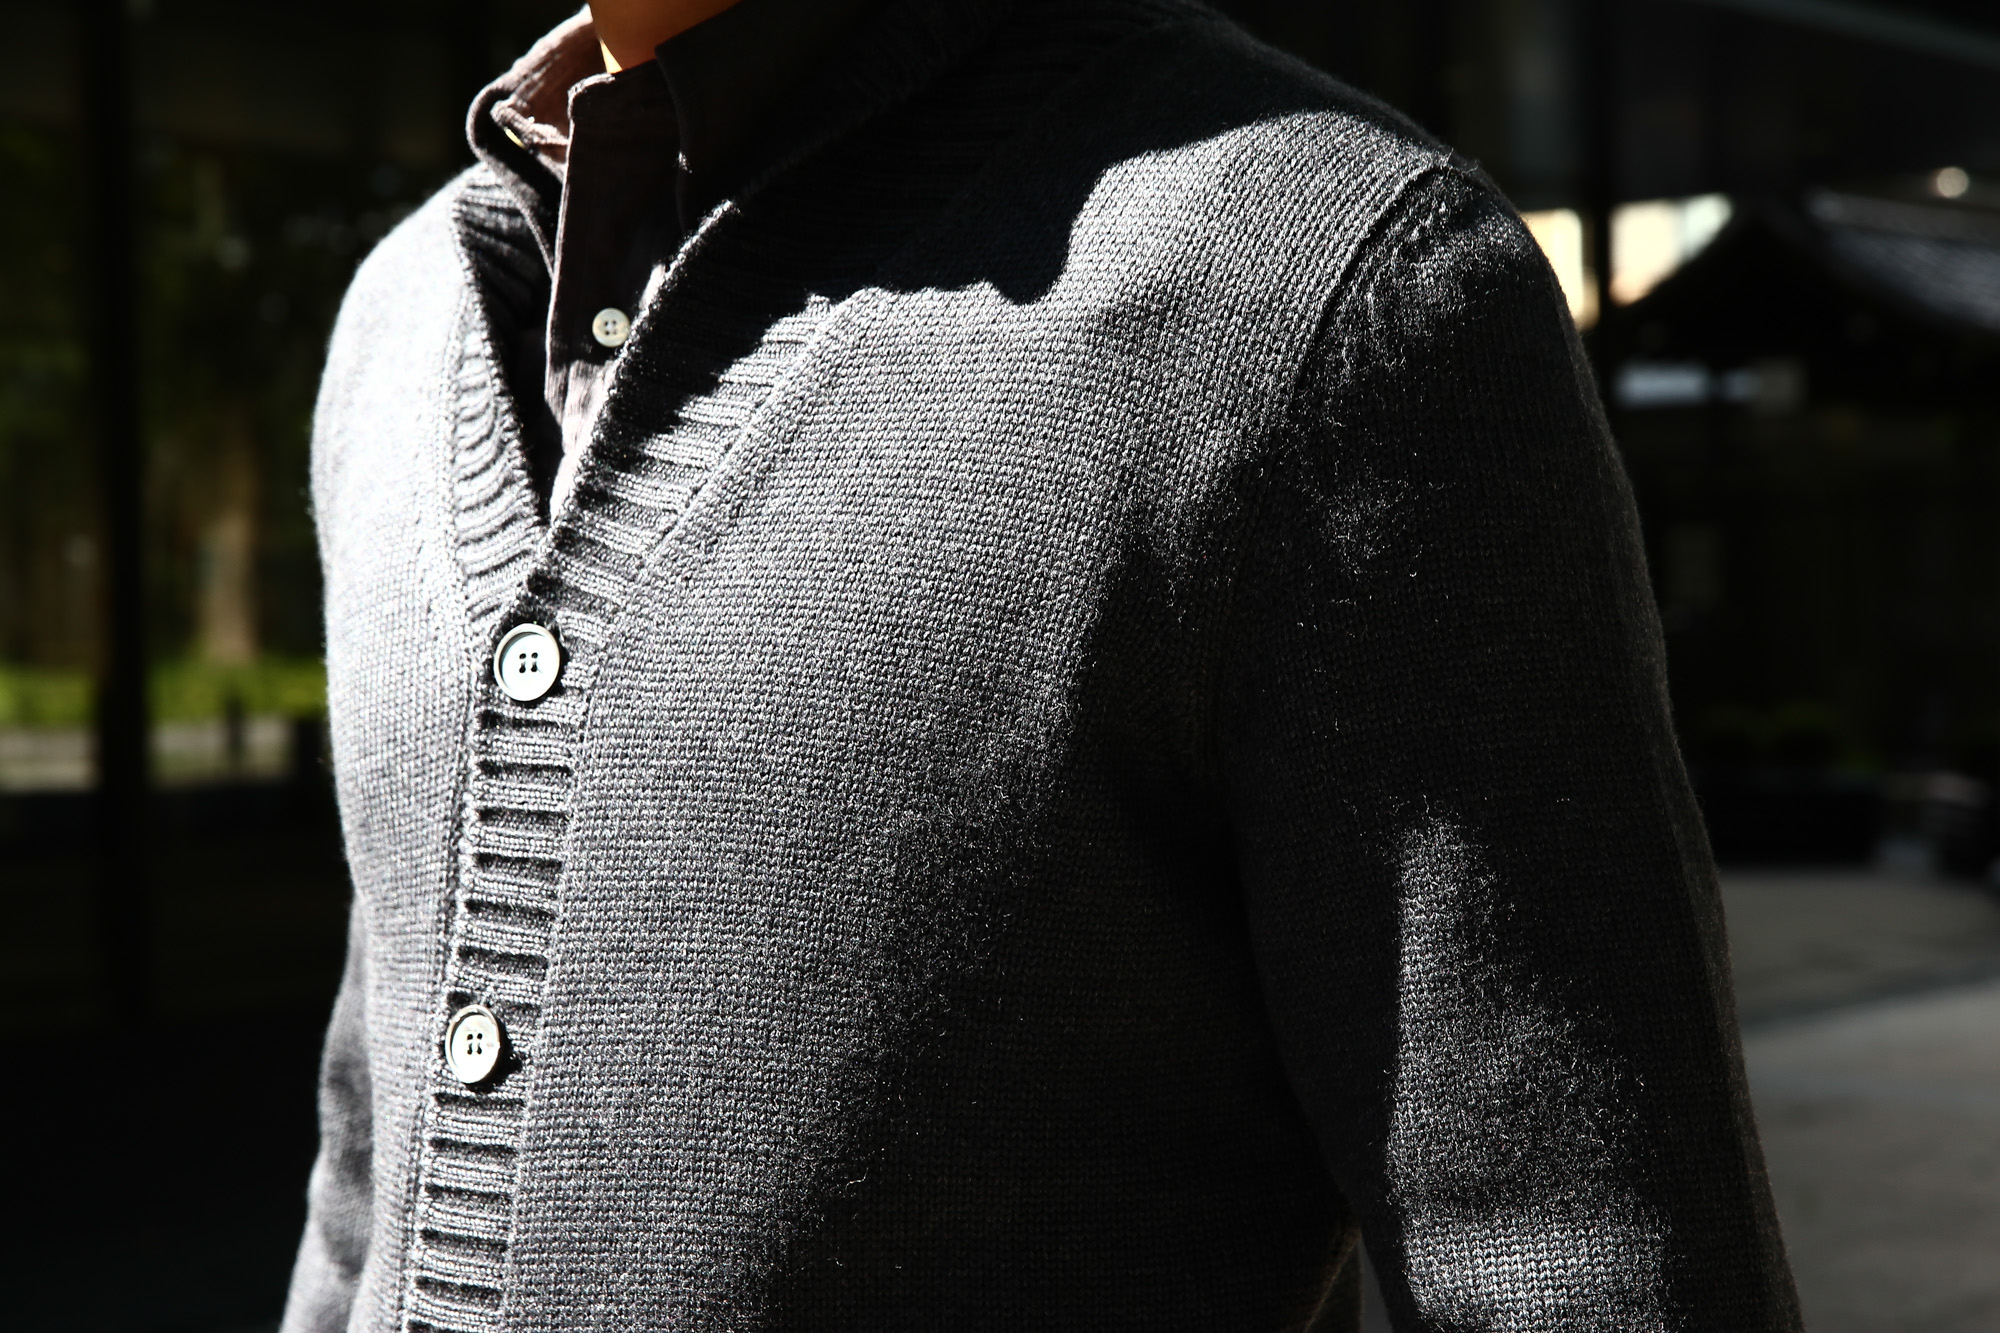 ZANONE (ザノーネ) Shawl Collar Cardigan 811947 Z0229 VIRGIN WOOL 100% ミドルゲージニット ショールカラーカーディガン CHARCOAL (チャコール・Z0006) MADE IN ITALY 2016 秋冬 Alto e Diritto 愛知 名古屋 ザノーネ